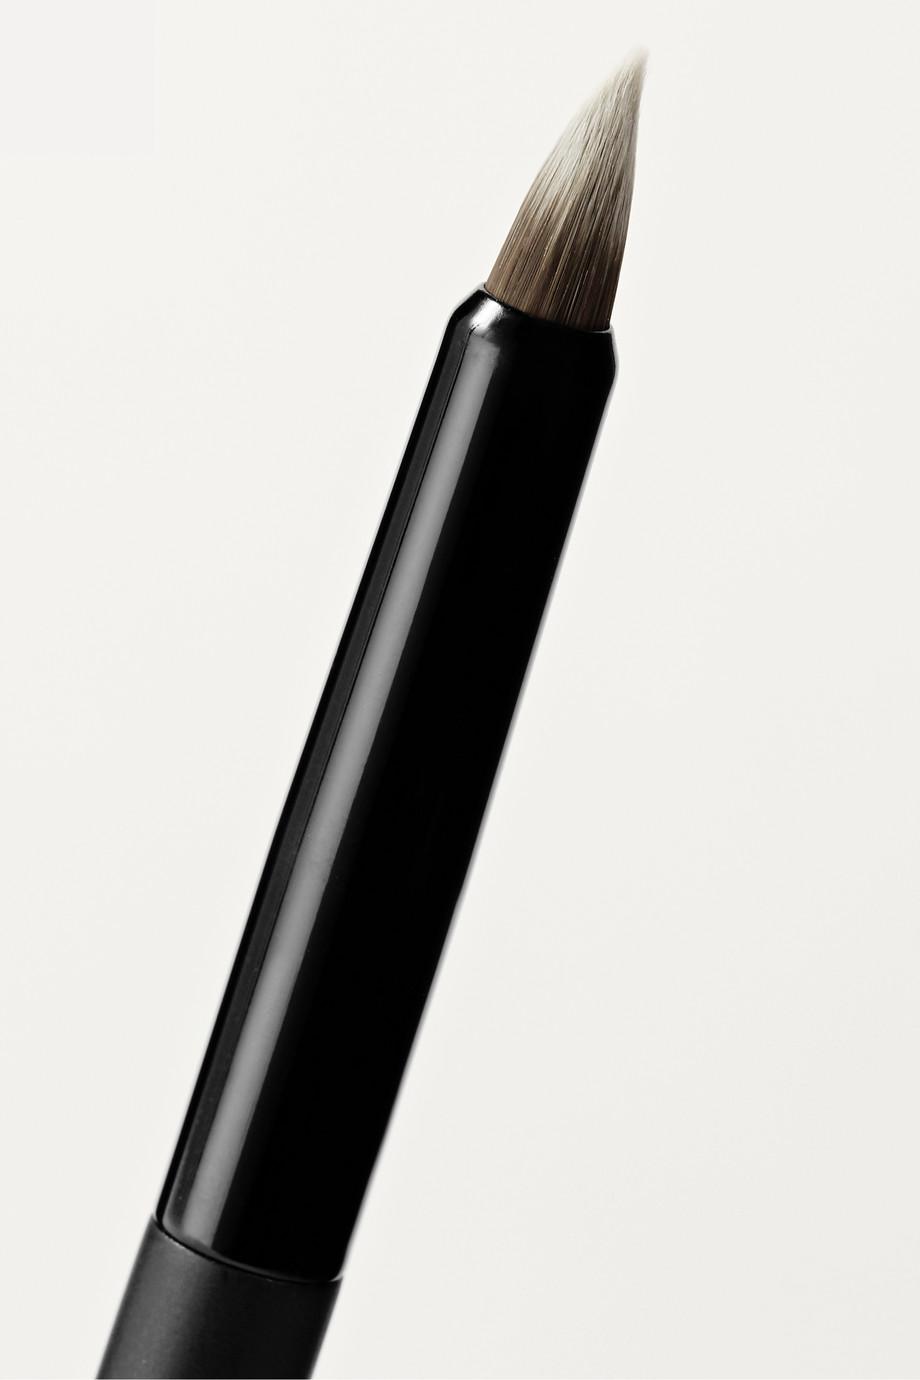 Rae Morris Jishaku 13 Vegan Deluxe Eyeliner Brush